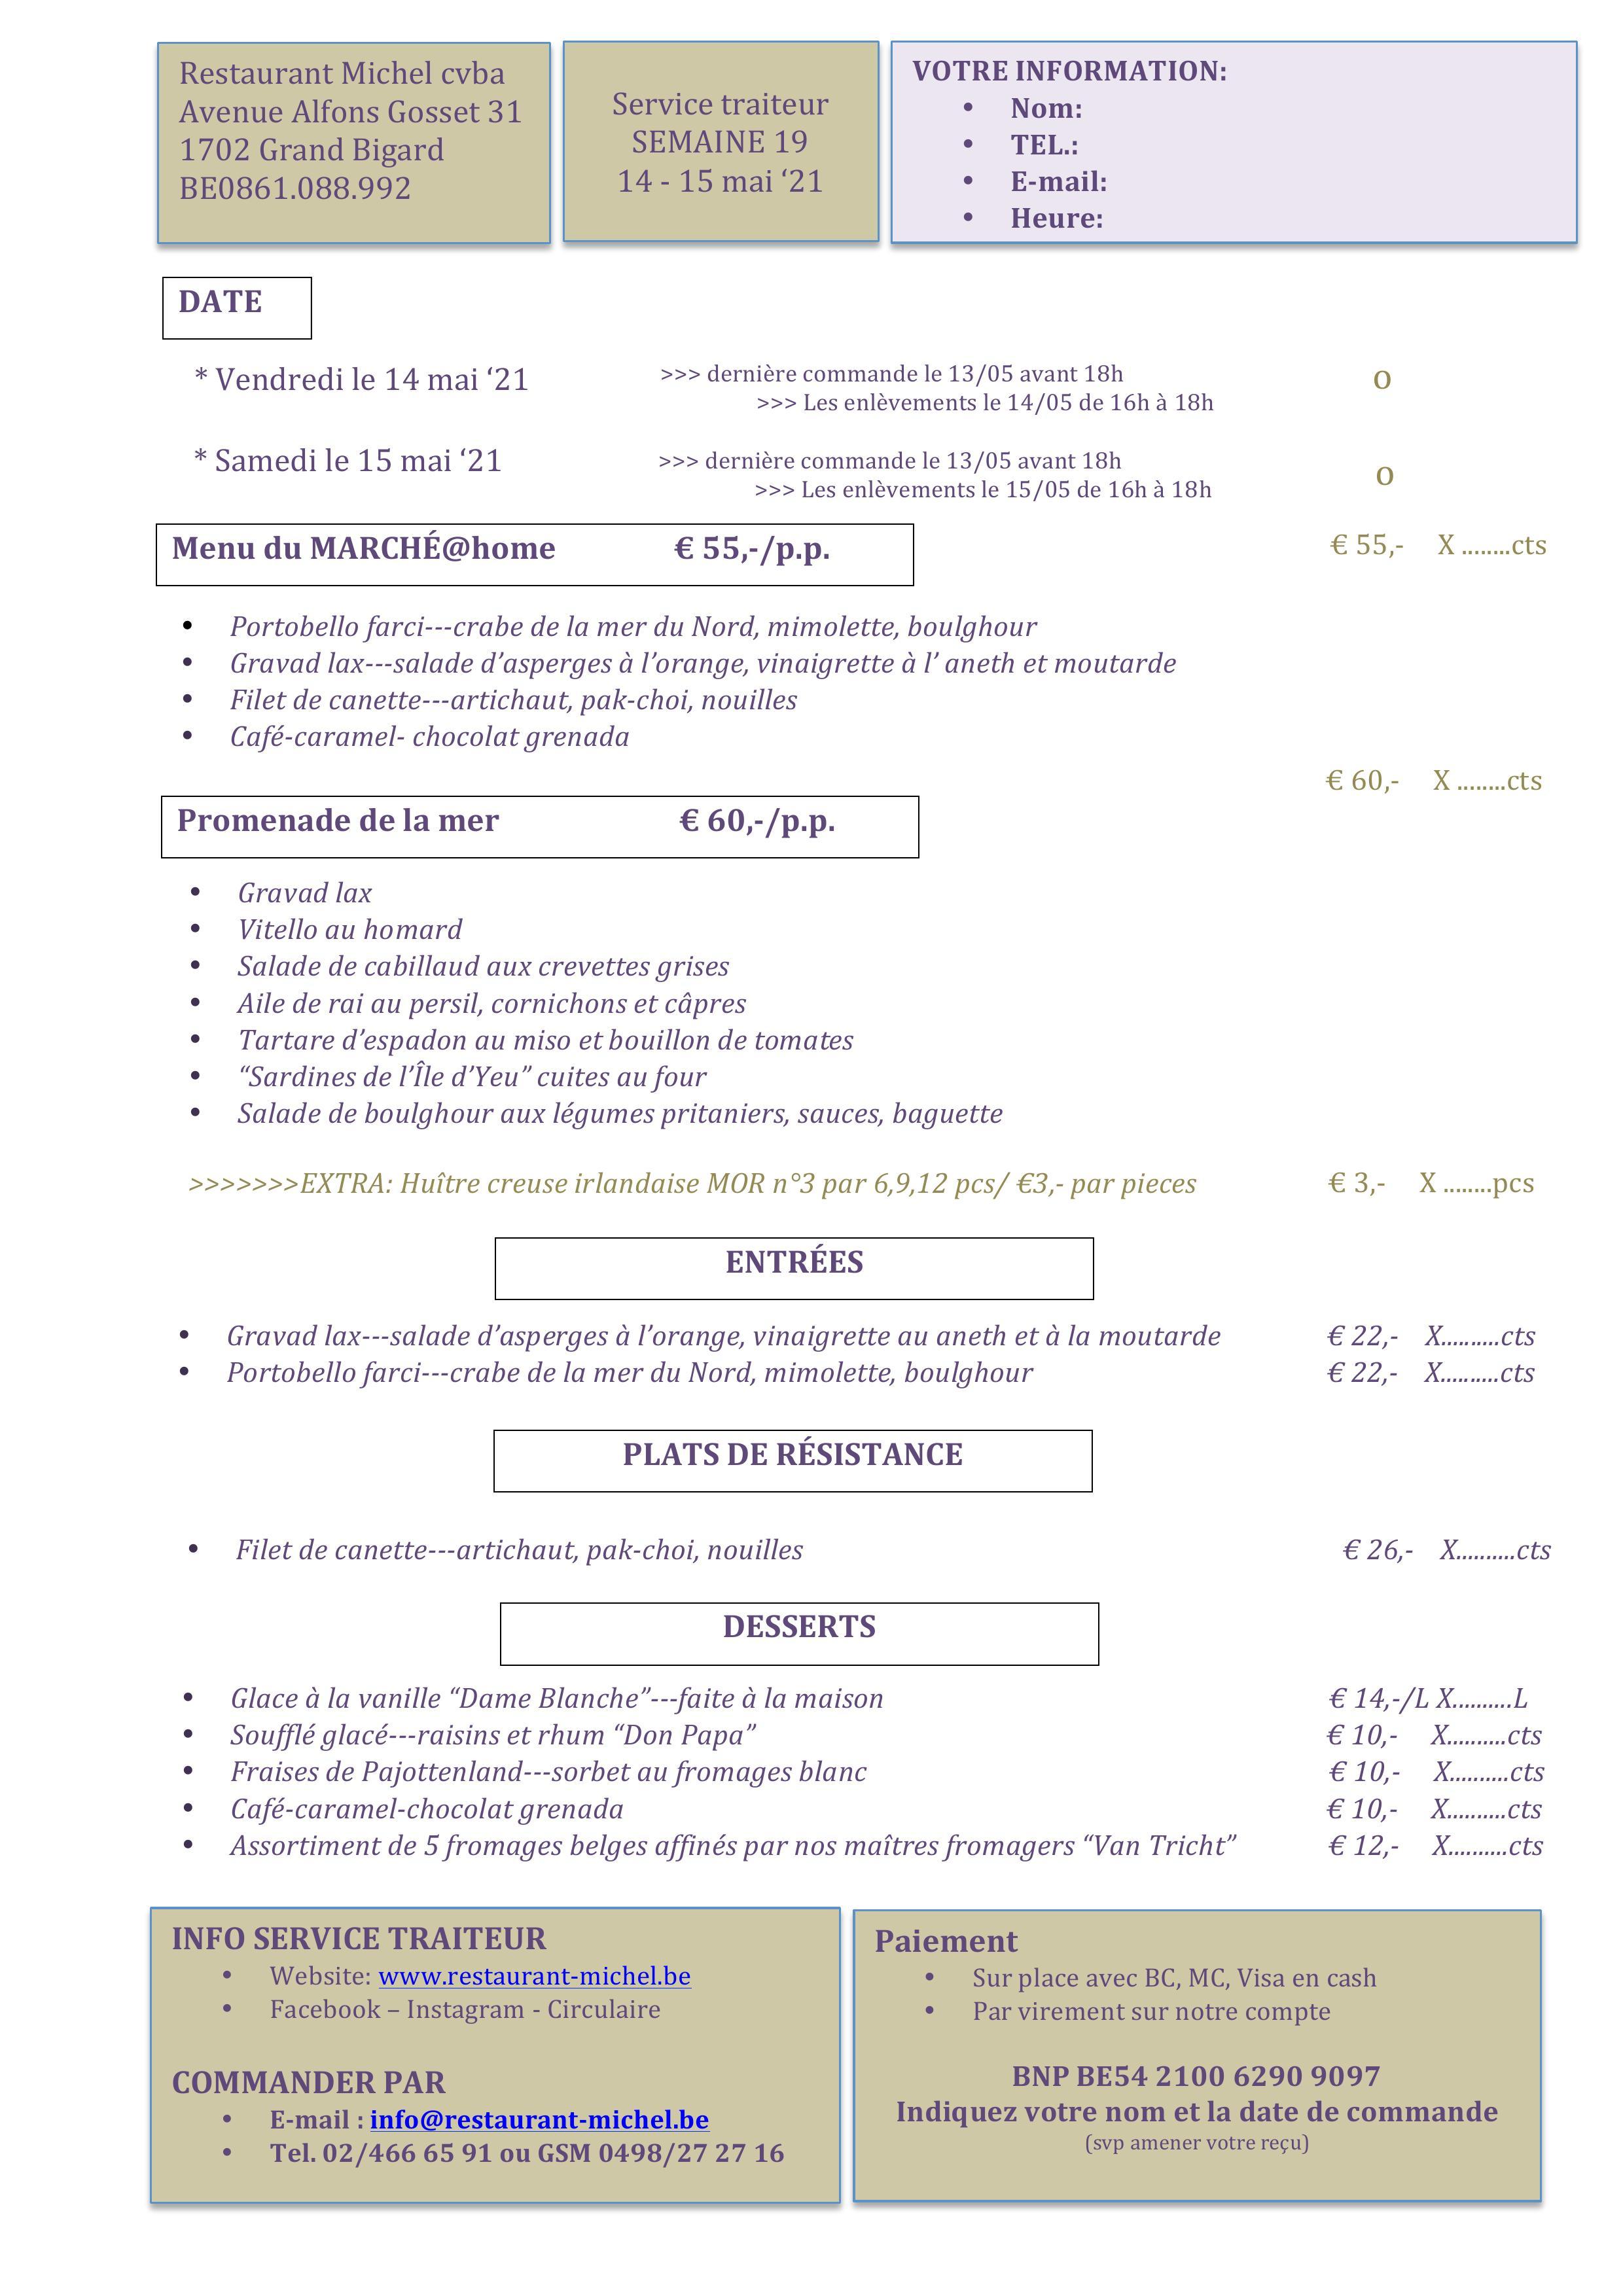 RM-2021-Traiteur-week19-listedecommande-Fr-correctie